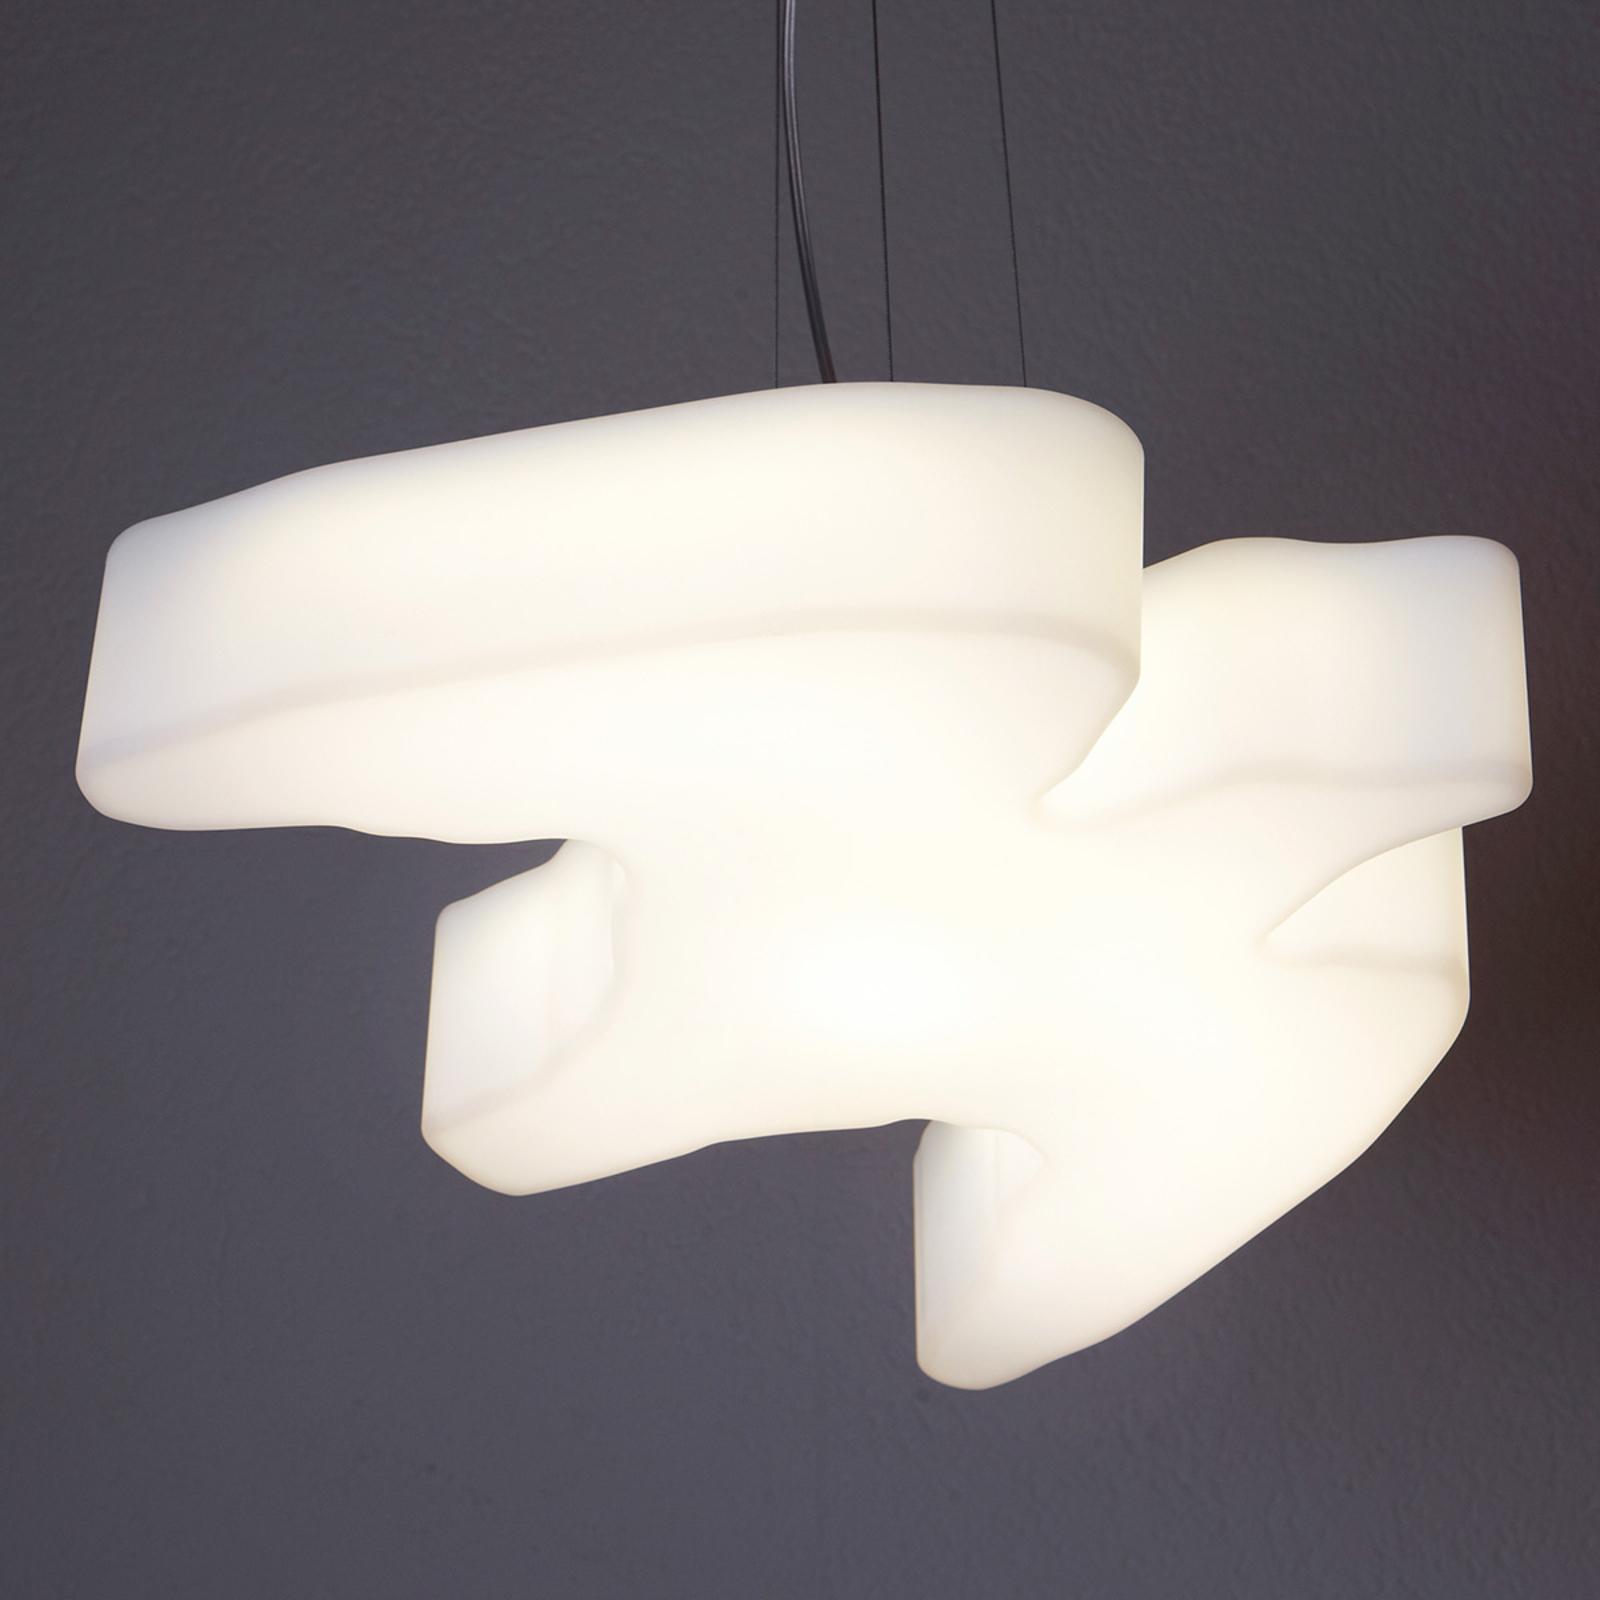 LED-hengelampe The Bird